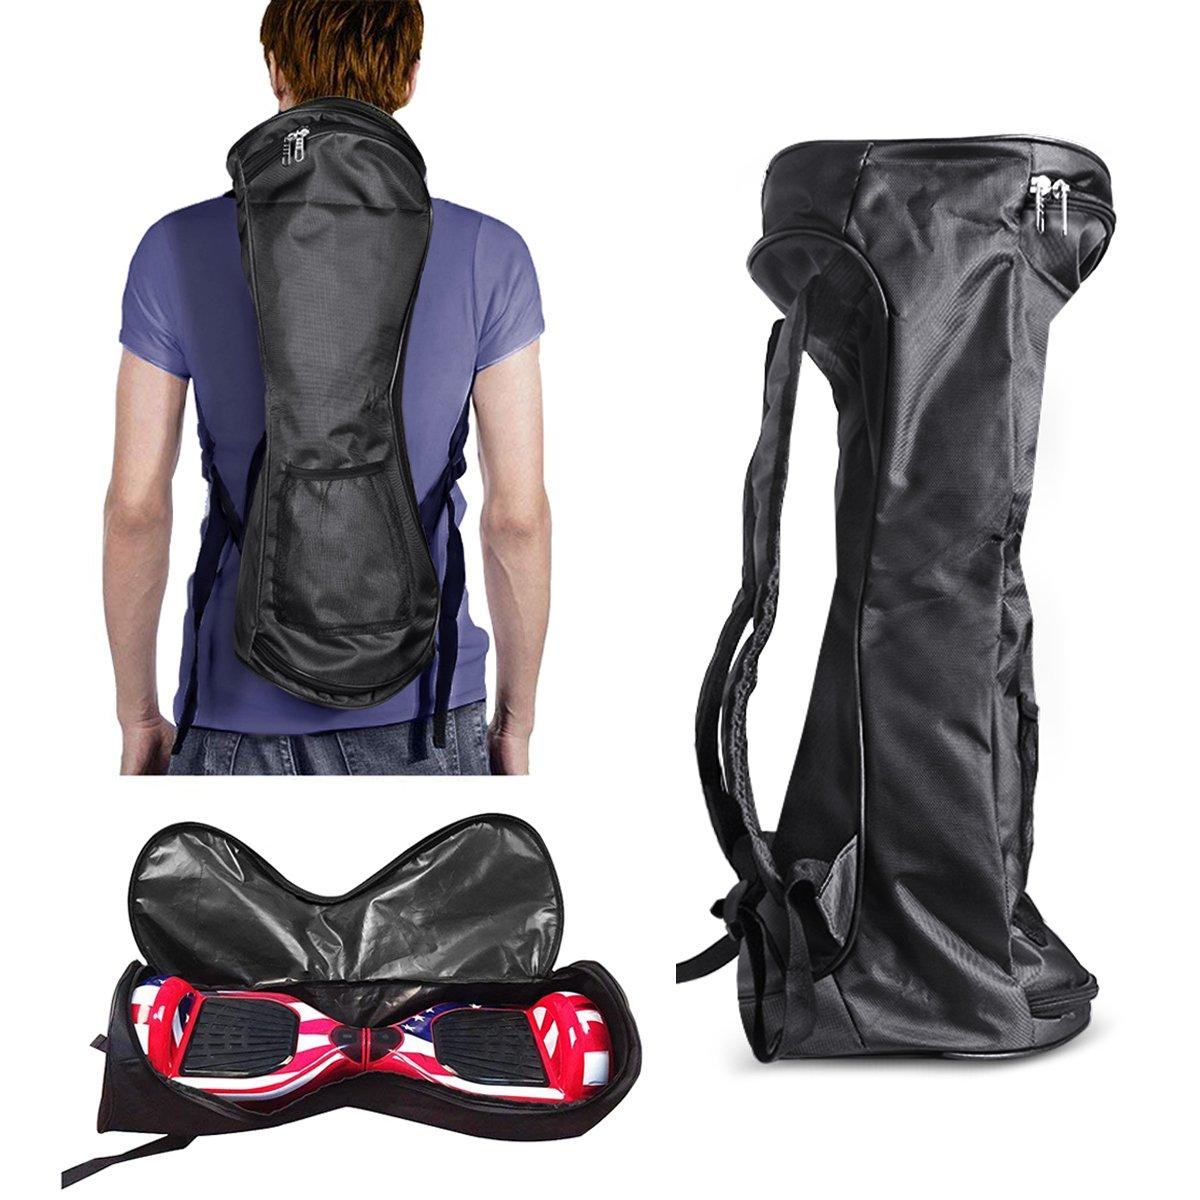 GameXcel Self-Balancing Scooter Carrying Backpack Bag for 6.5'' 7'' and 8'' Two-Wheel Hover Electric Skate Board Smart Balancing Scooters Storage Mesh Pocket Adjustable Shoulder Strap Black